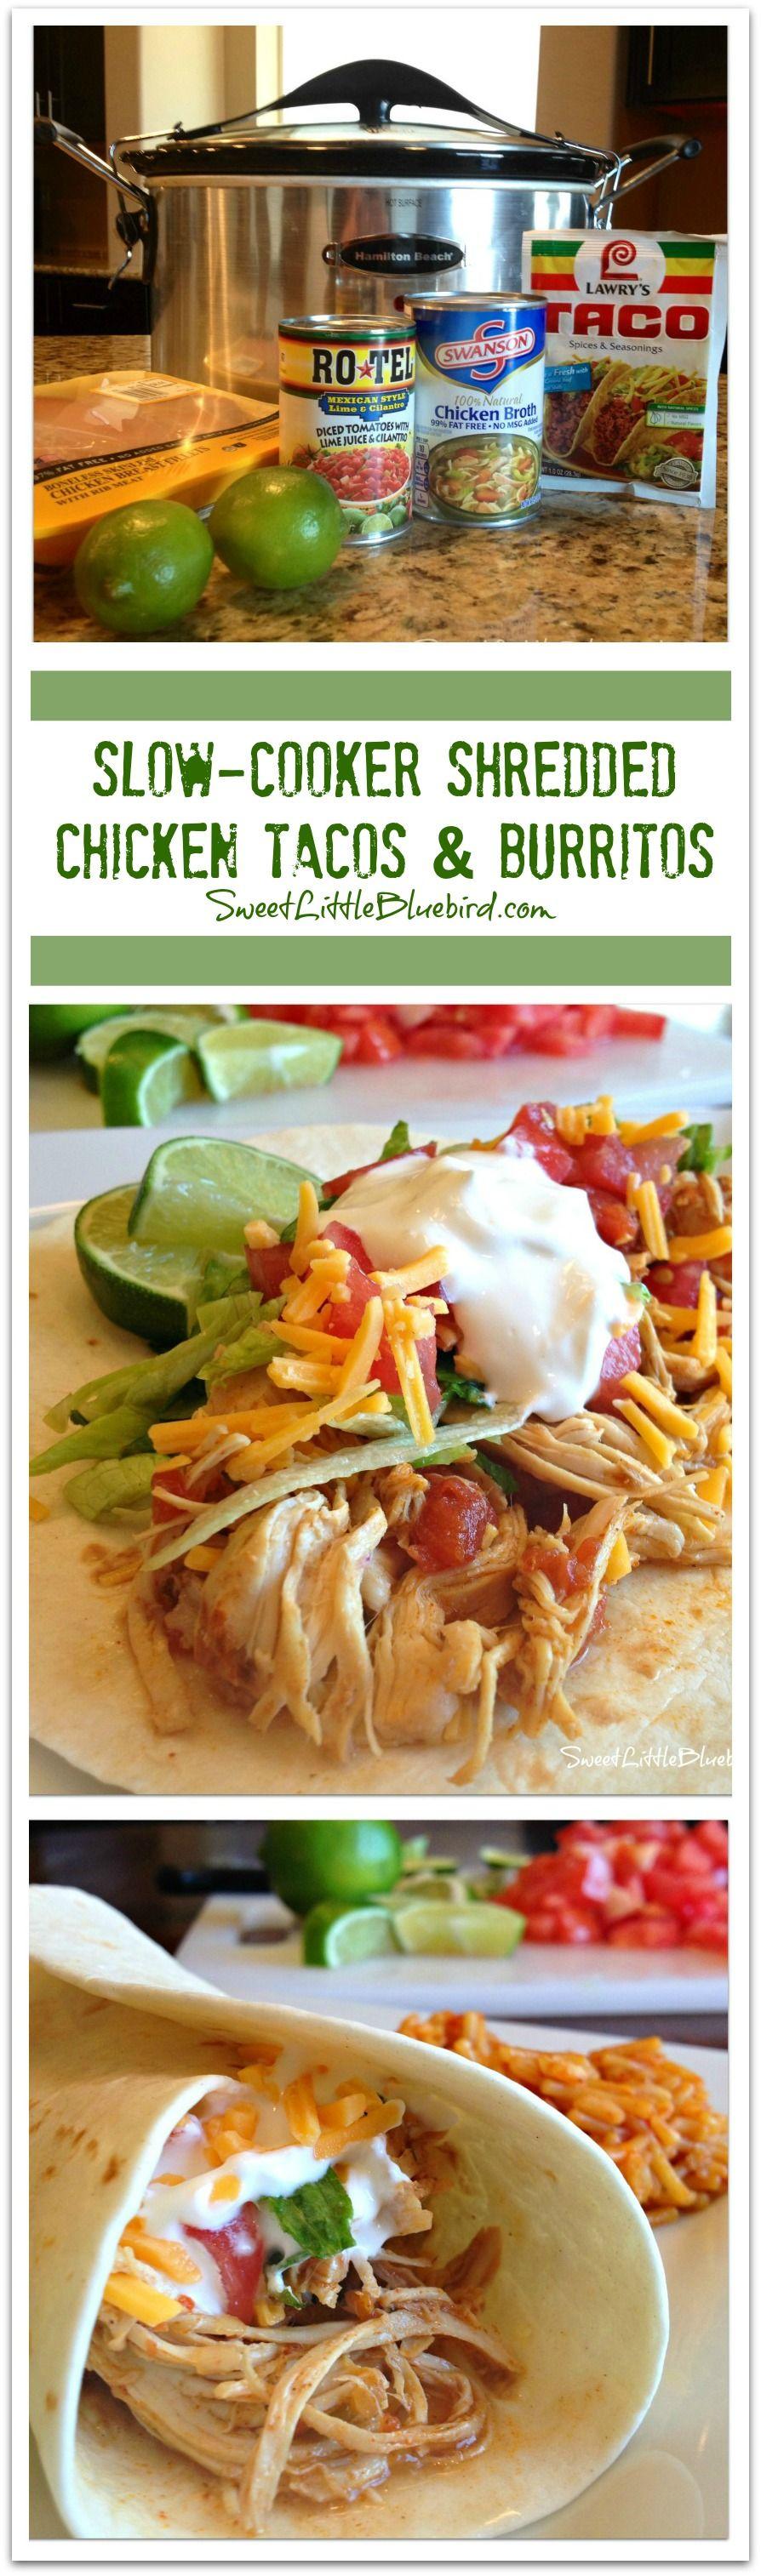 Slow Cooker Shredded Chicken Tacos and Burritos #shreddedchickentacos